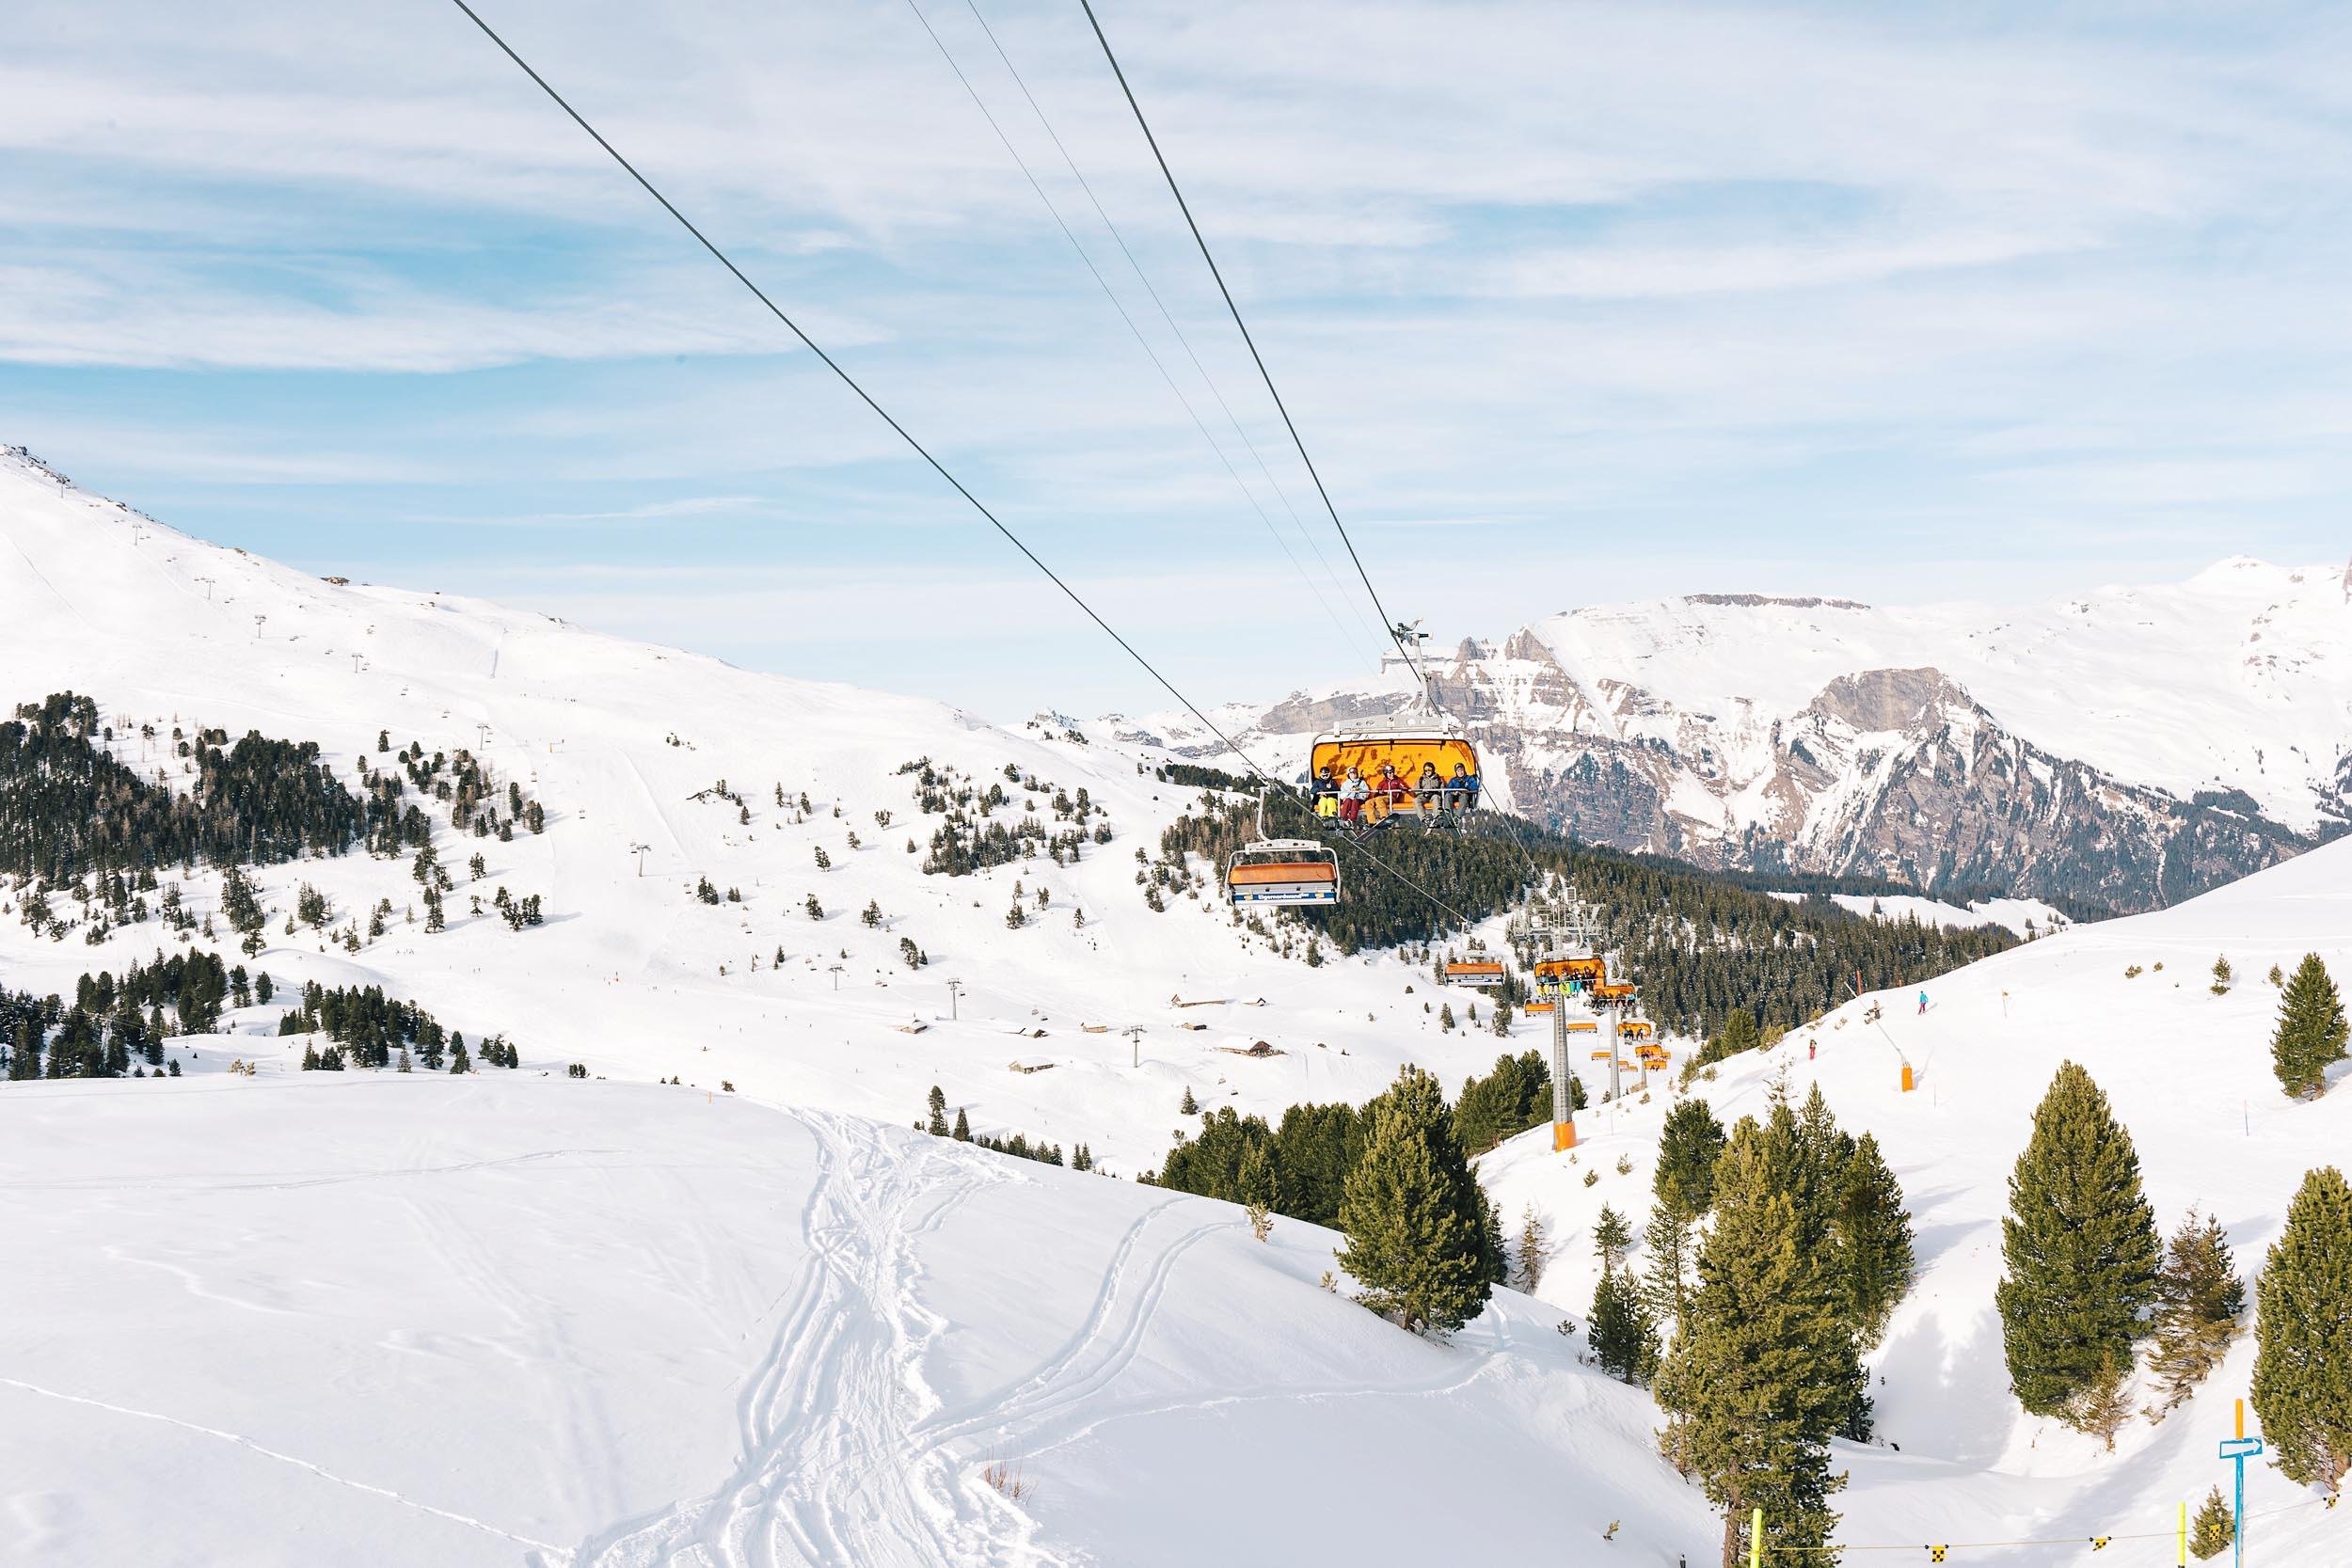 Views heading to Grindelwald via sled